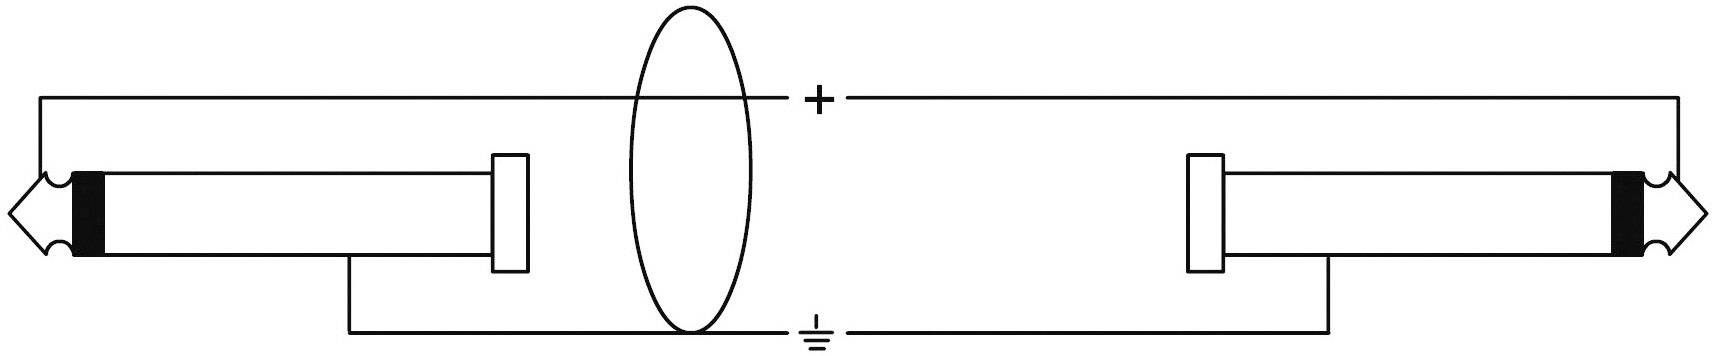 Kábel Cordial CPL 3 PP, [1x jack zástrčka 6,35 mm - 1x jack zástrčka 6,35 mm], 3 m, čierna